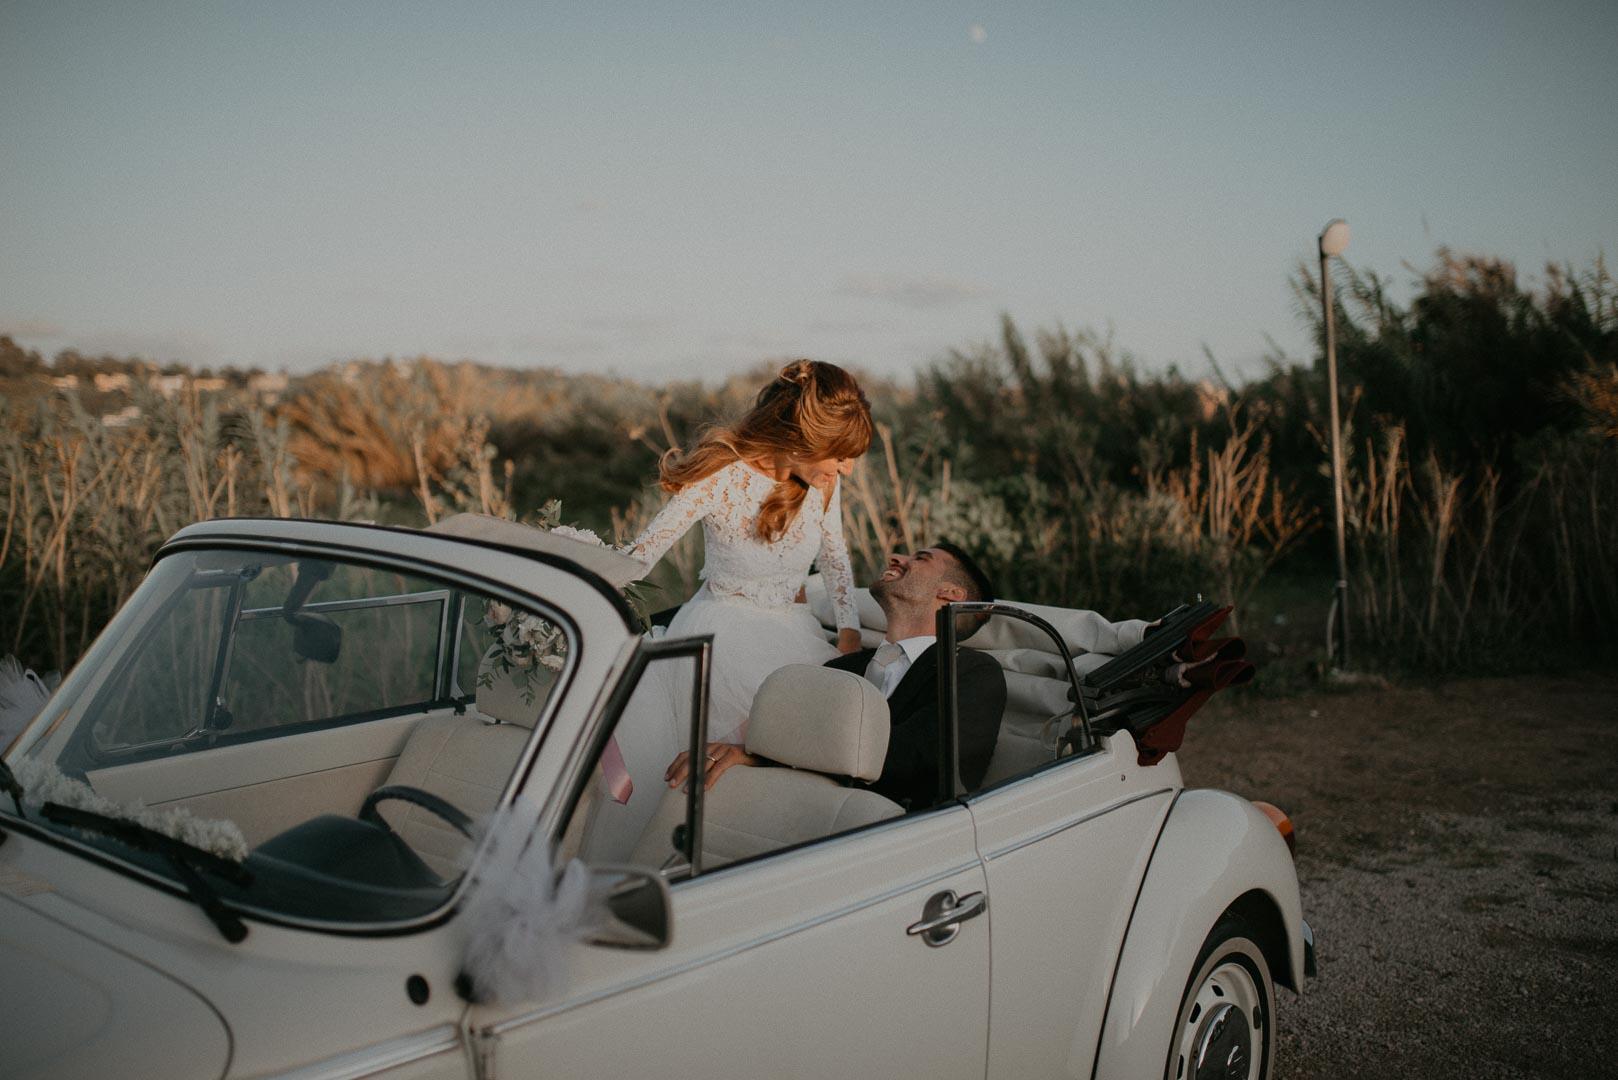 wedding-photographer-destination-fineart-bespoke-reportage-napoli-nabilah-vivianeizzo-spazio46-91